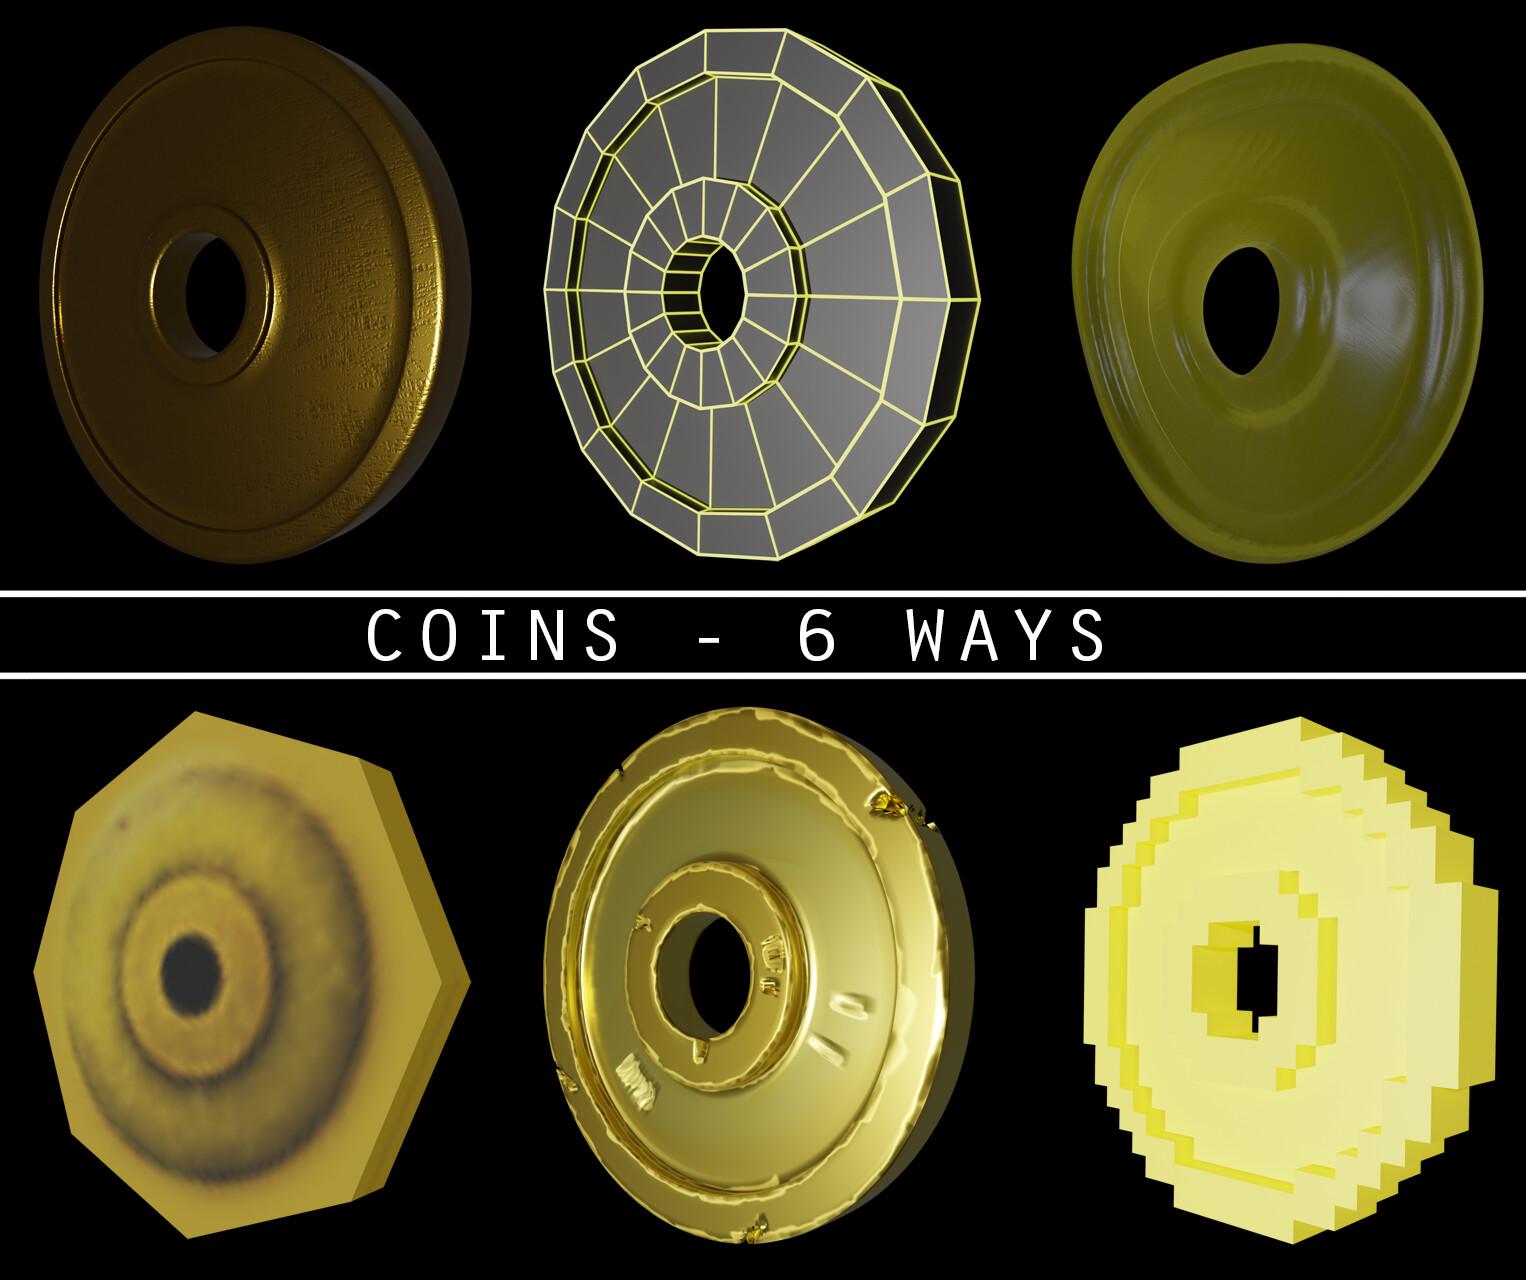 Coins Study